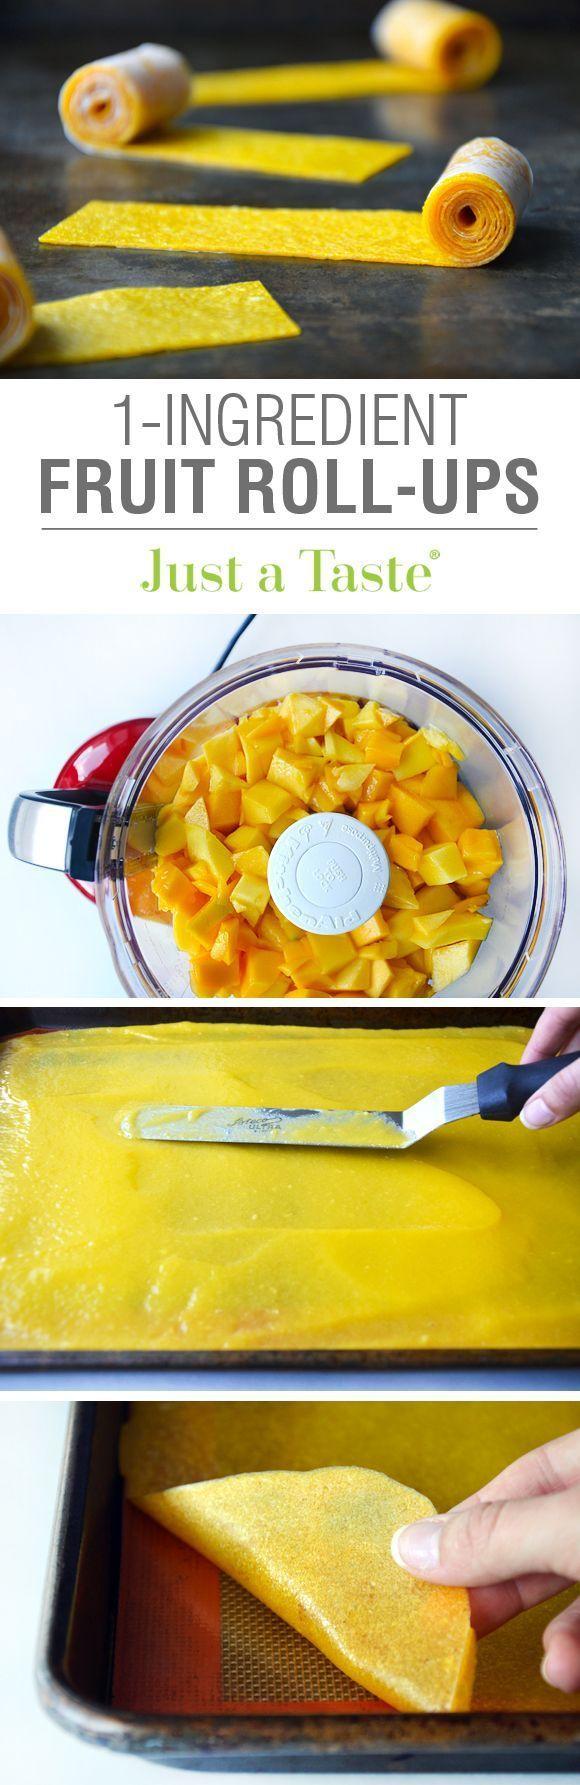 Healthy Homemade Mango Fruit Roll-Ups #recipe from @Just a Taste | Kelly Senyei